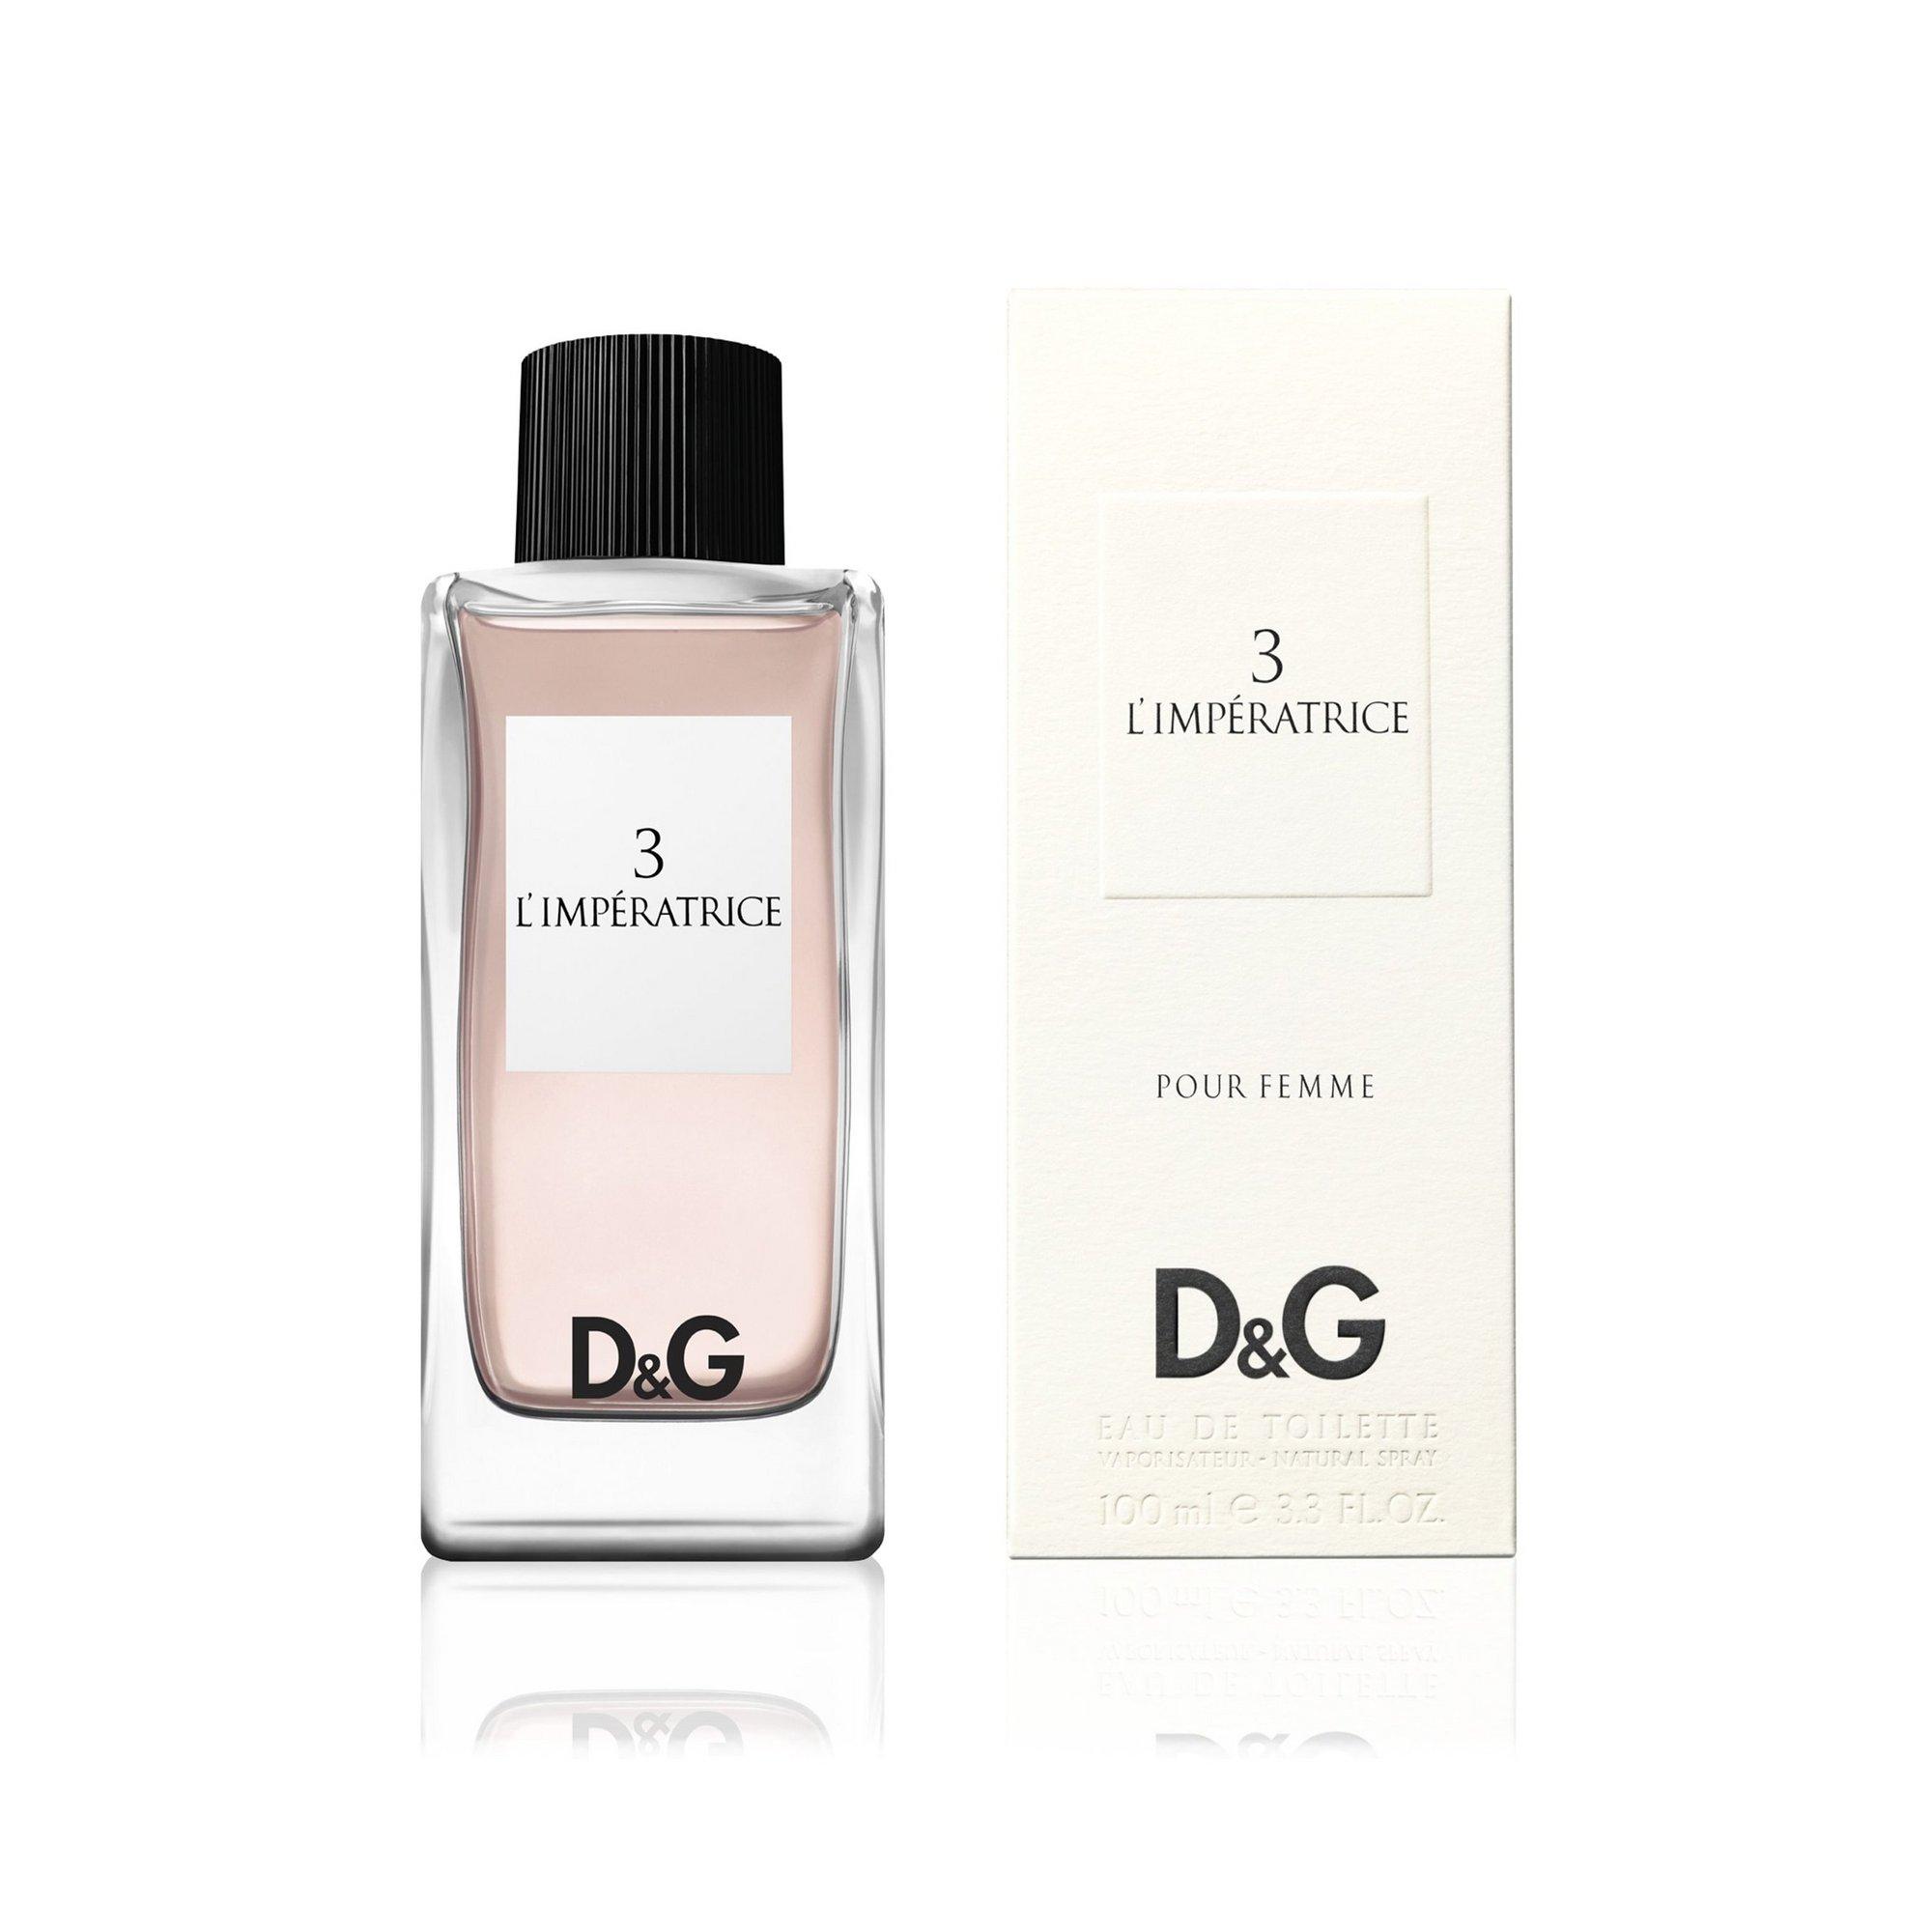 Image of Dolce and Gabbana 3 L Imperatrice 100ml Eau De Toilette